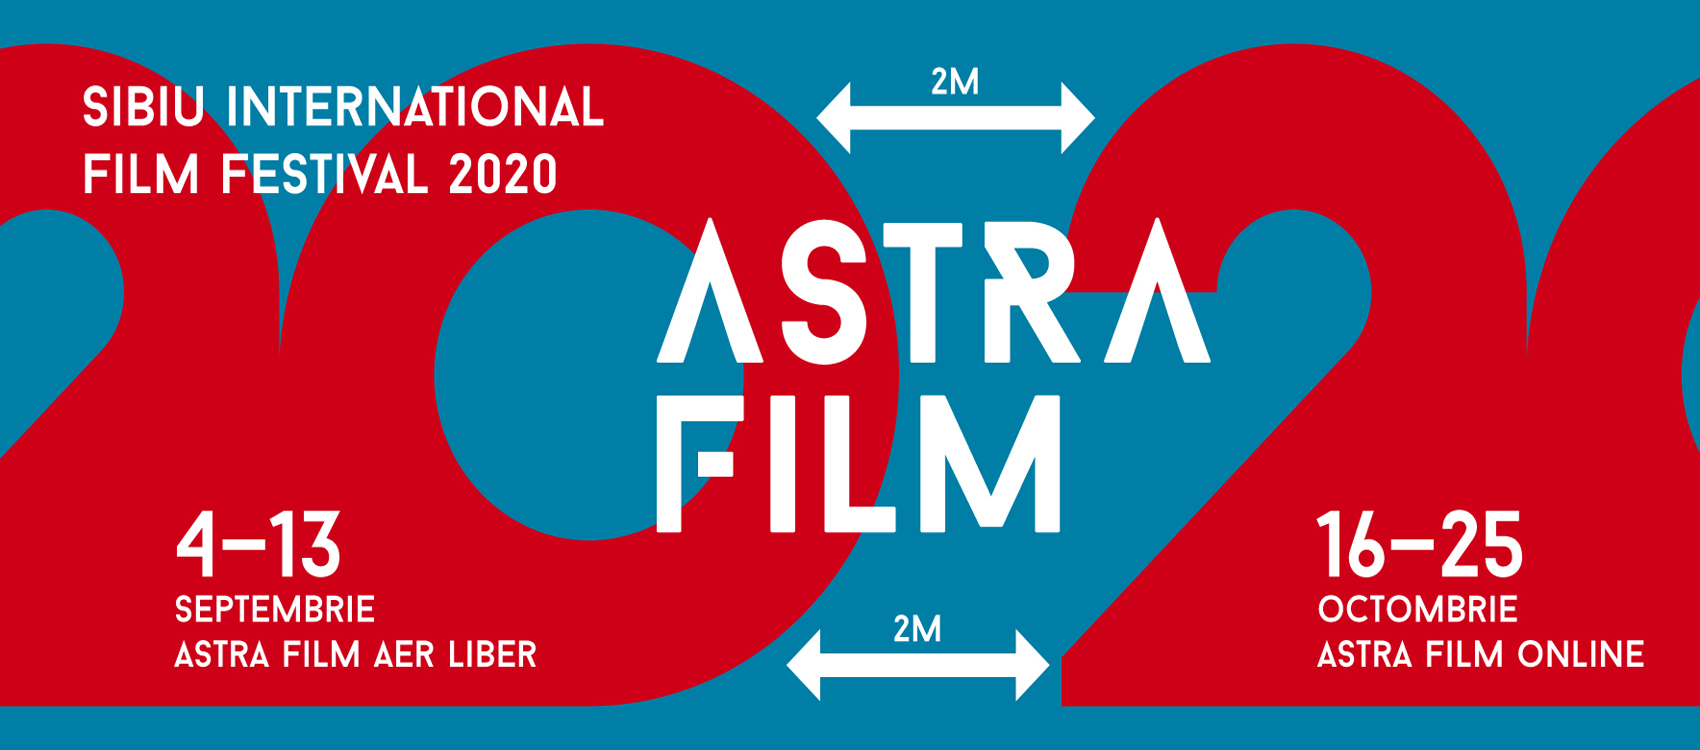 Astra Film Festival Sibiu